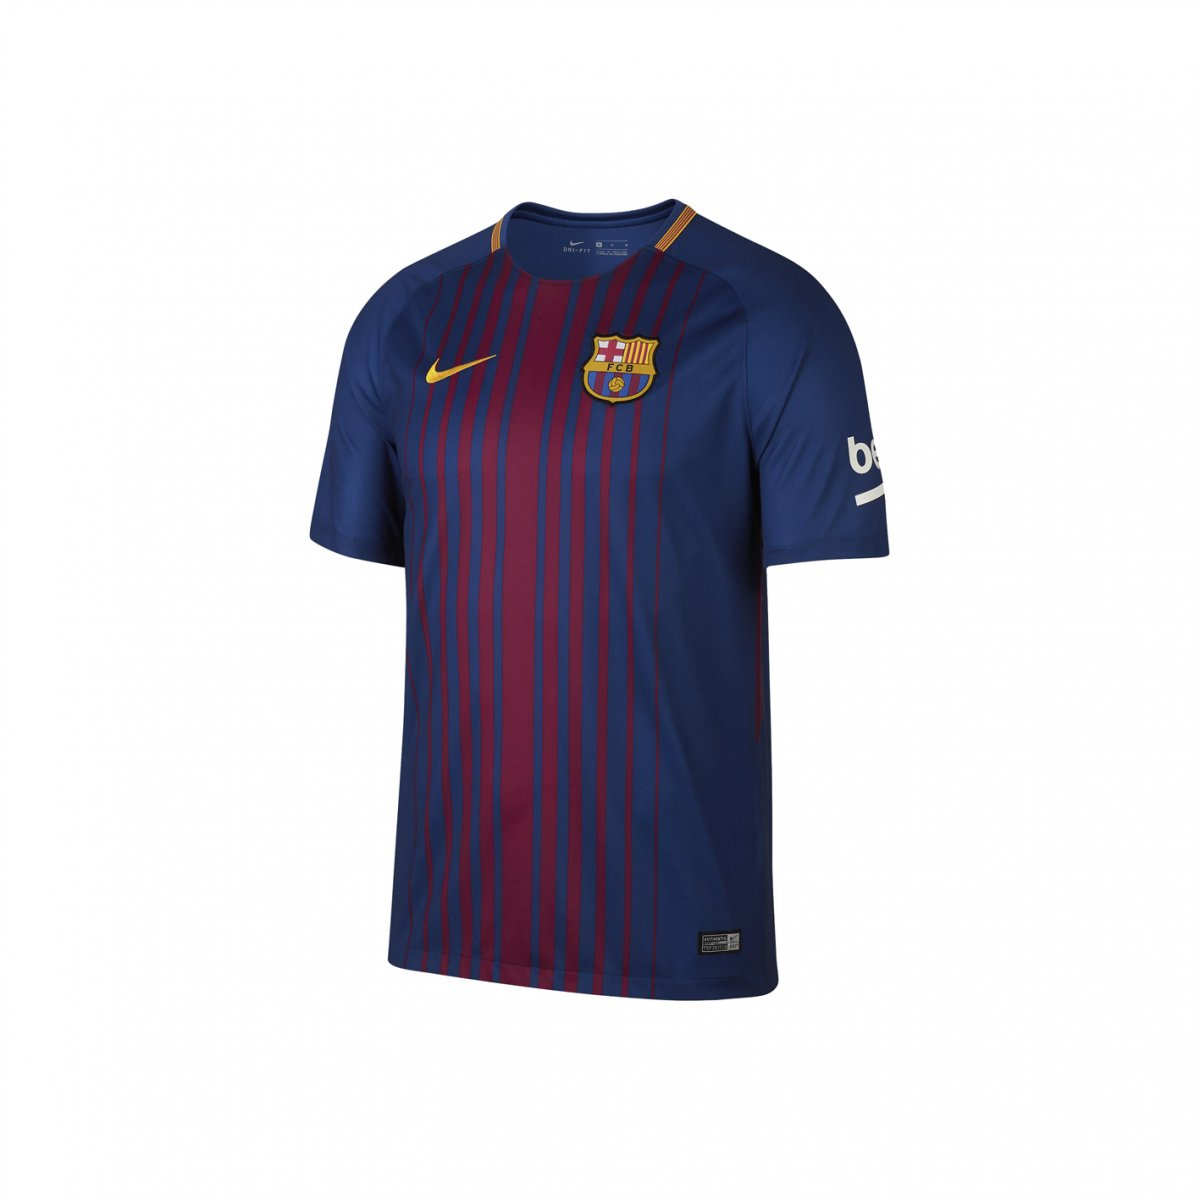 Amplie a imagem. Camiseta Infantil Nike Barcelona Dry Stadium Home 2017 18   Camiseta ... 89d421cd791